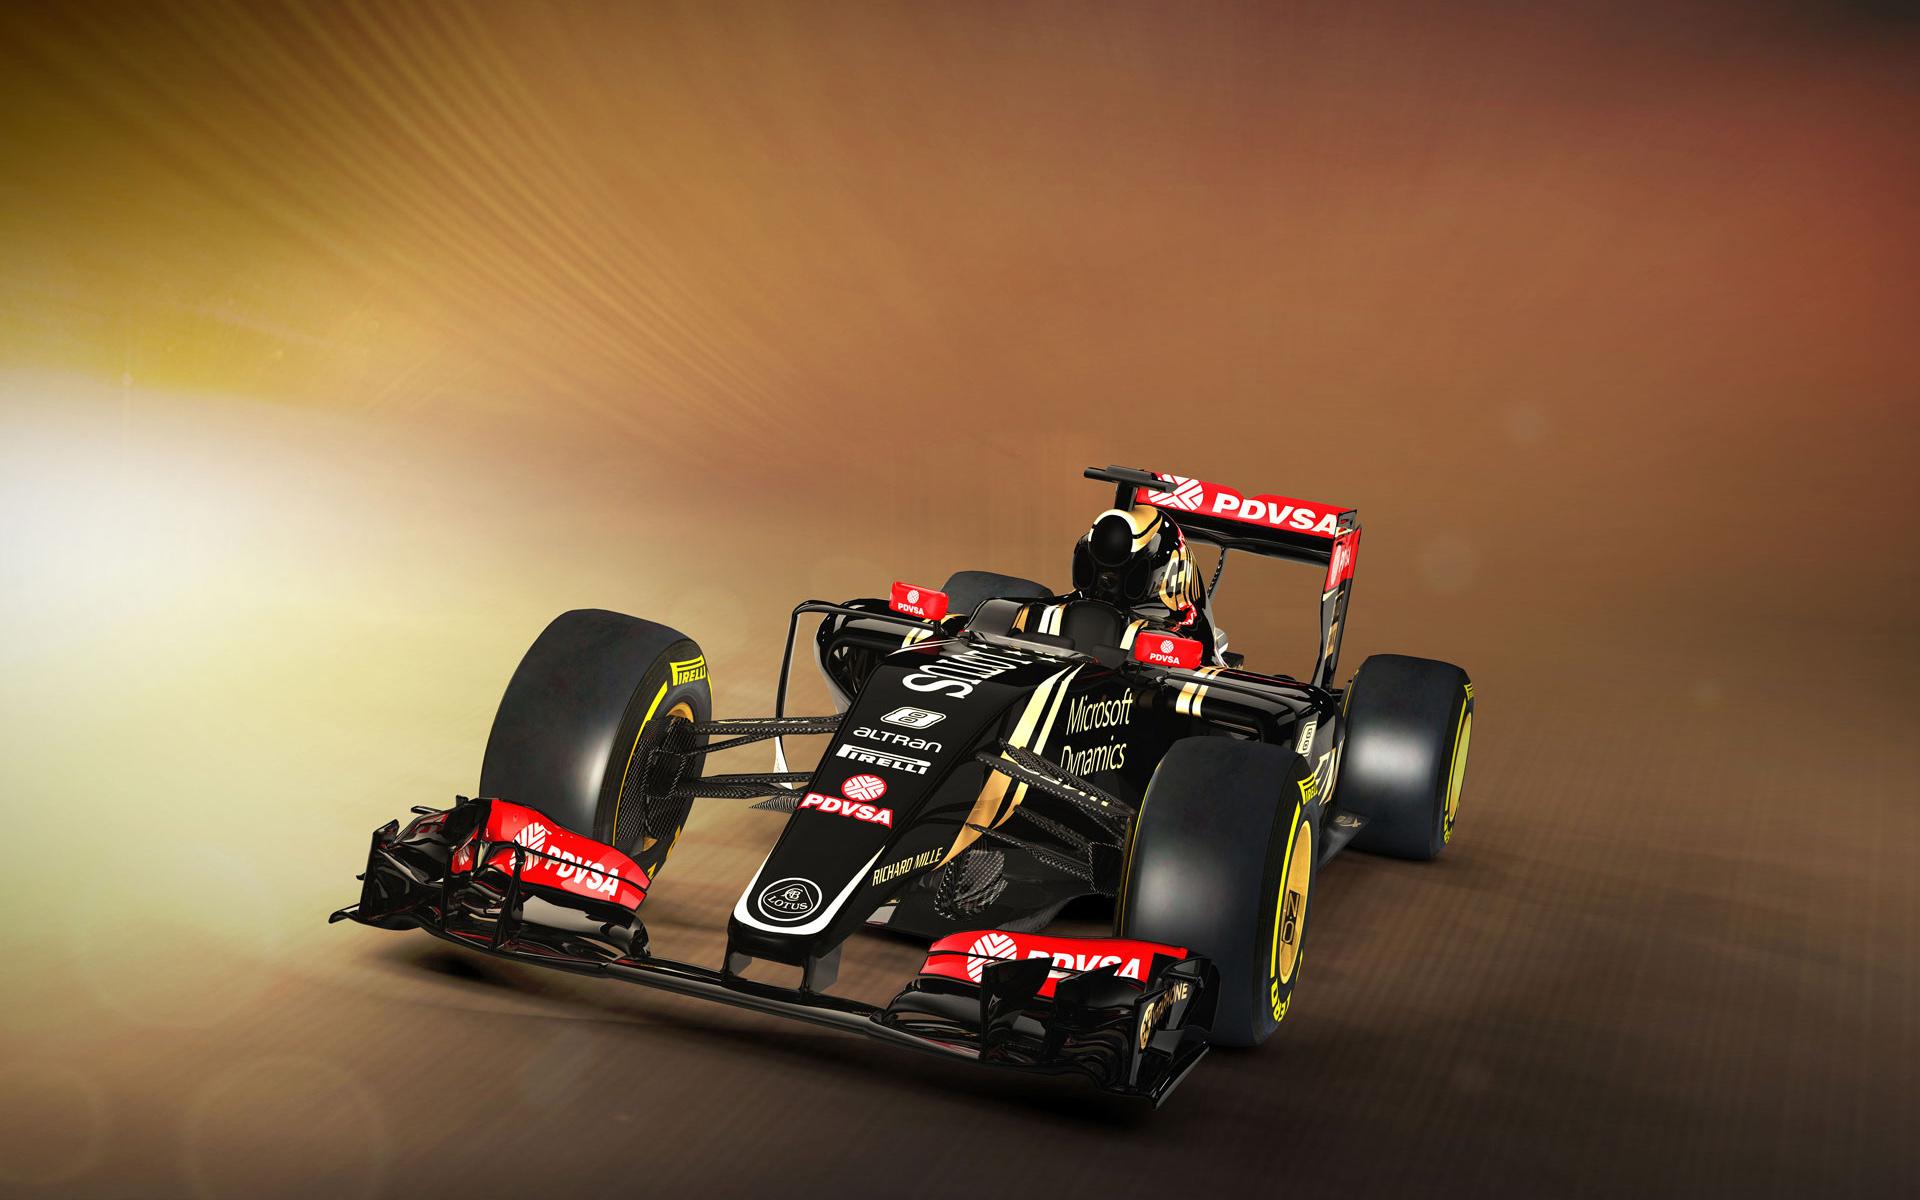 2015 Lotus E23 Formula 1 Wallpapers HD Wallpapers 1920x1200